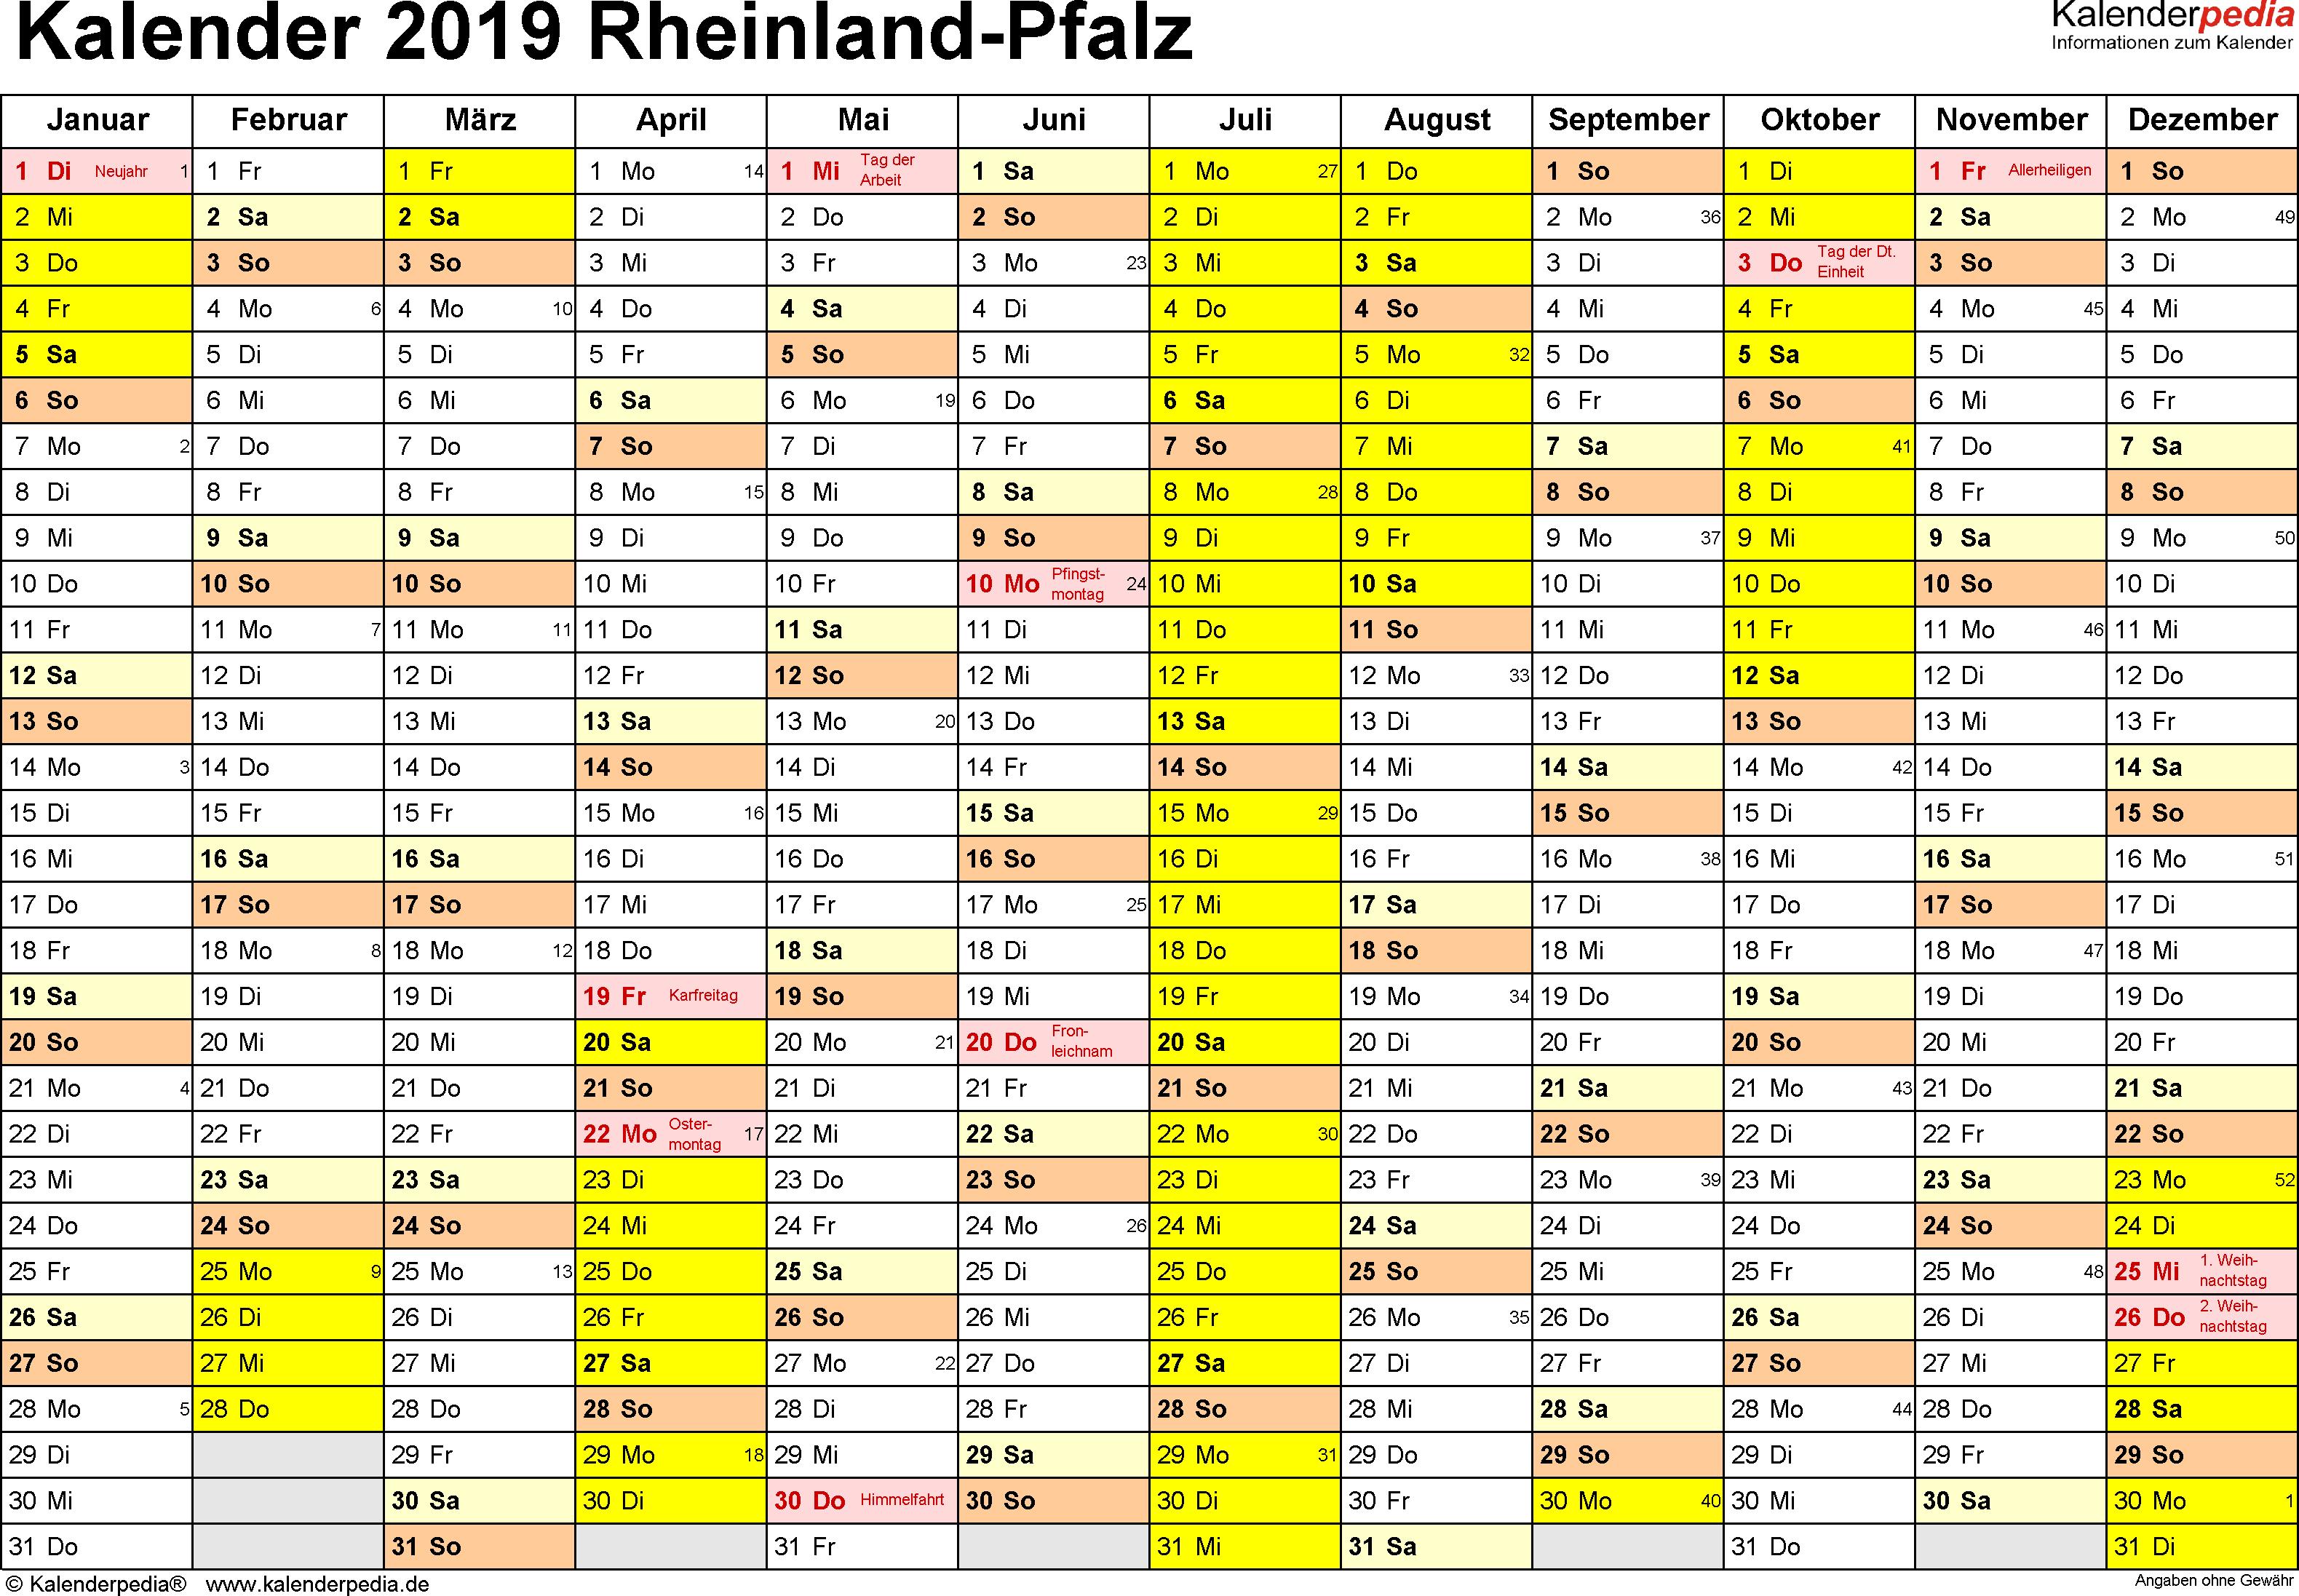 Kalender 2019 Rheinland-Pfalz